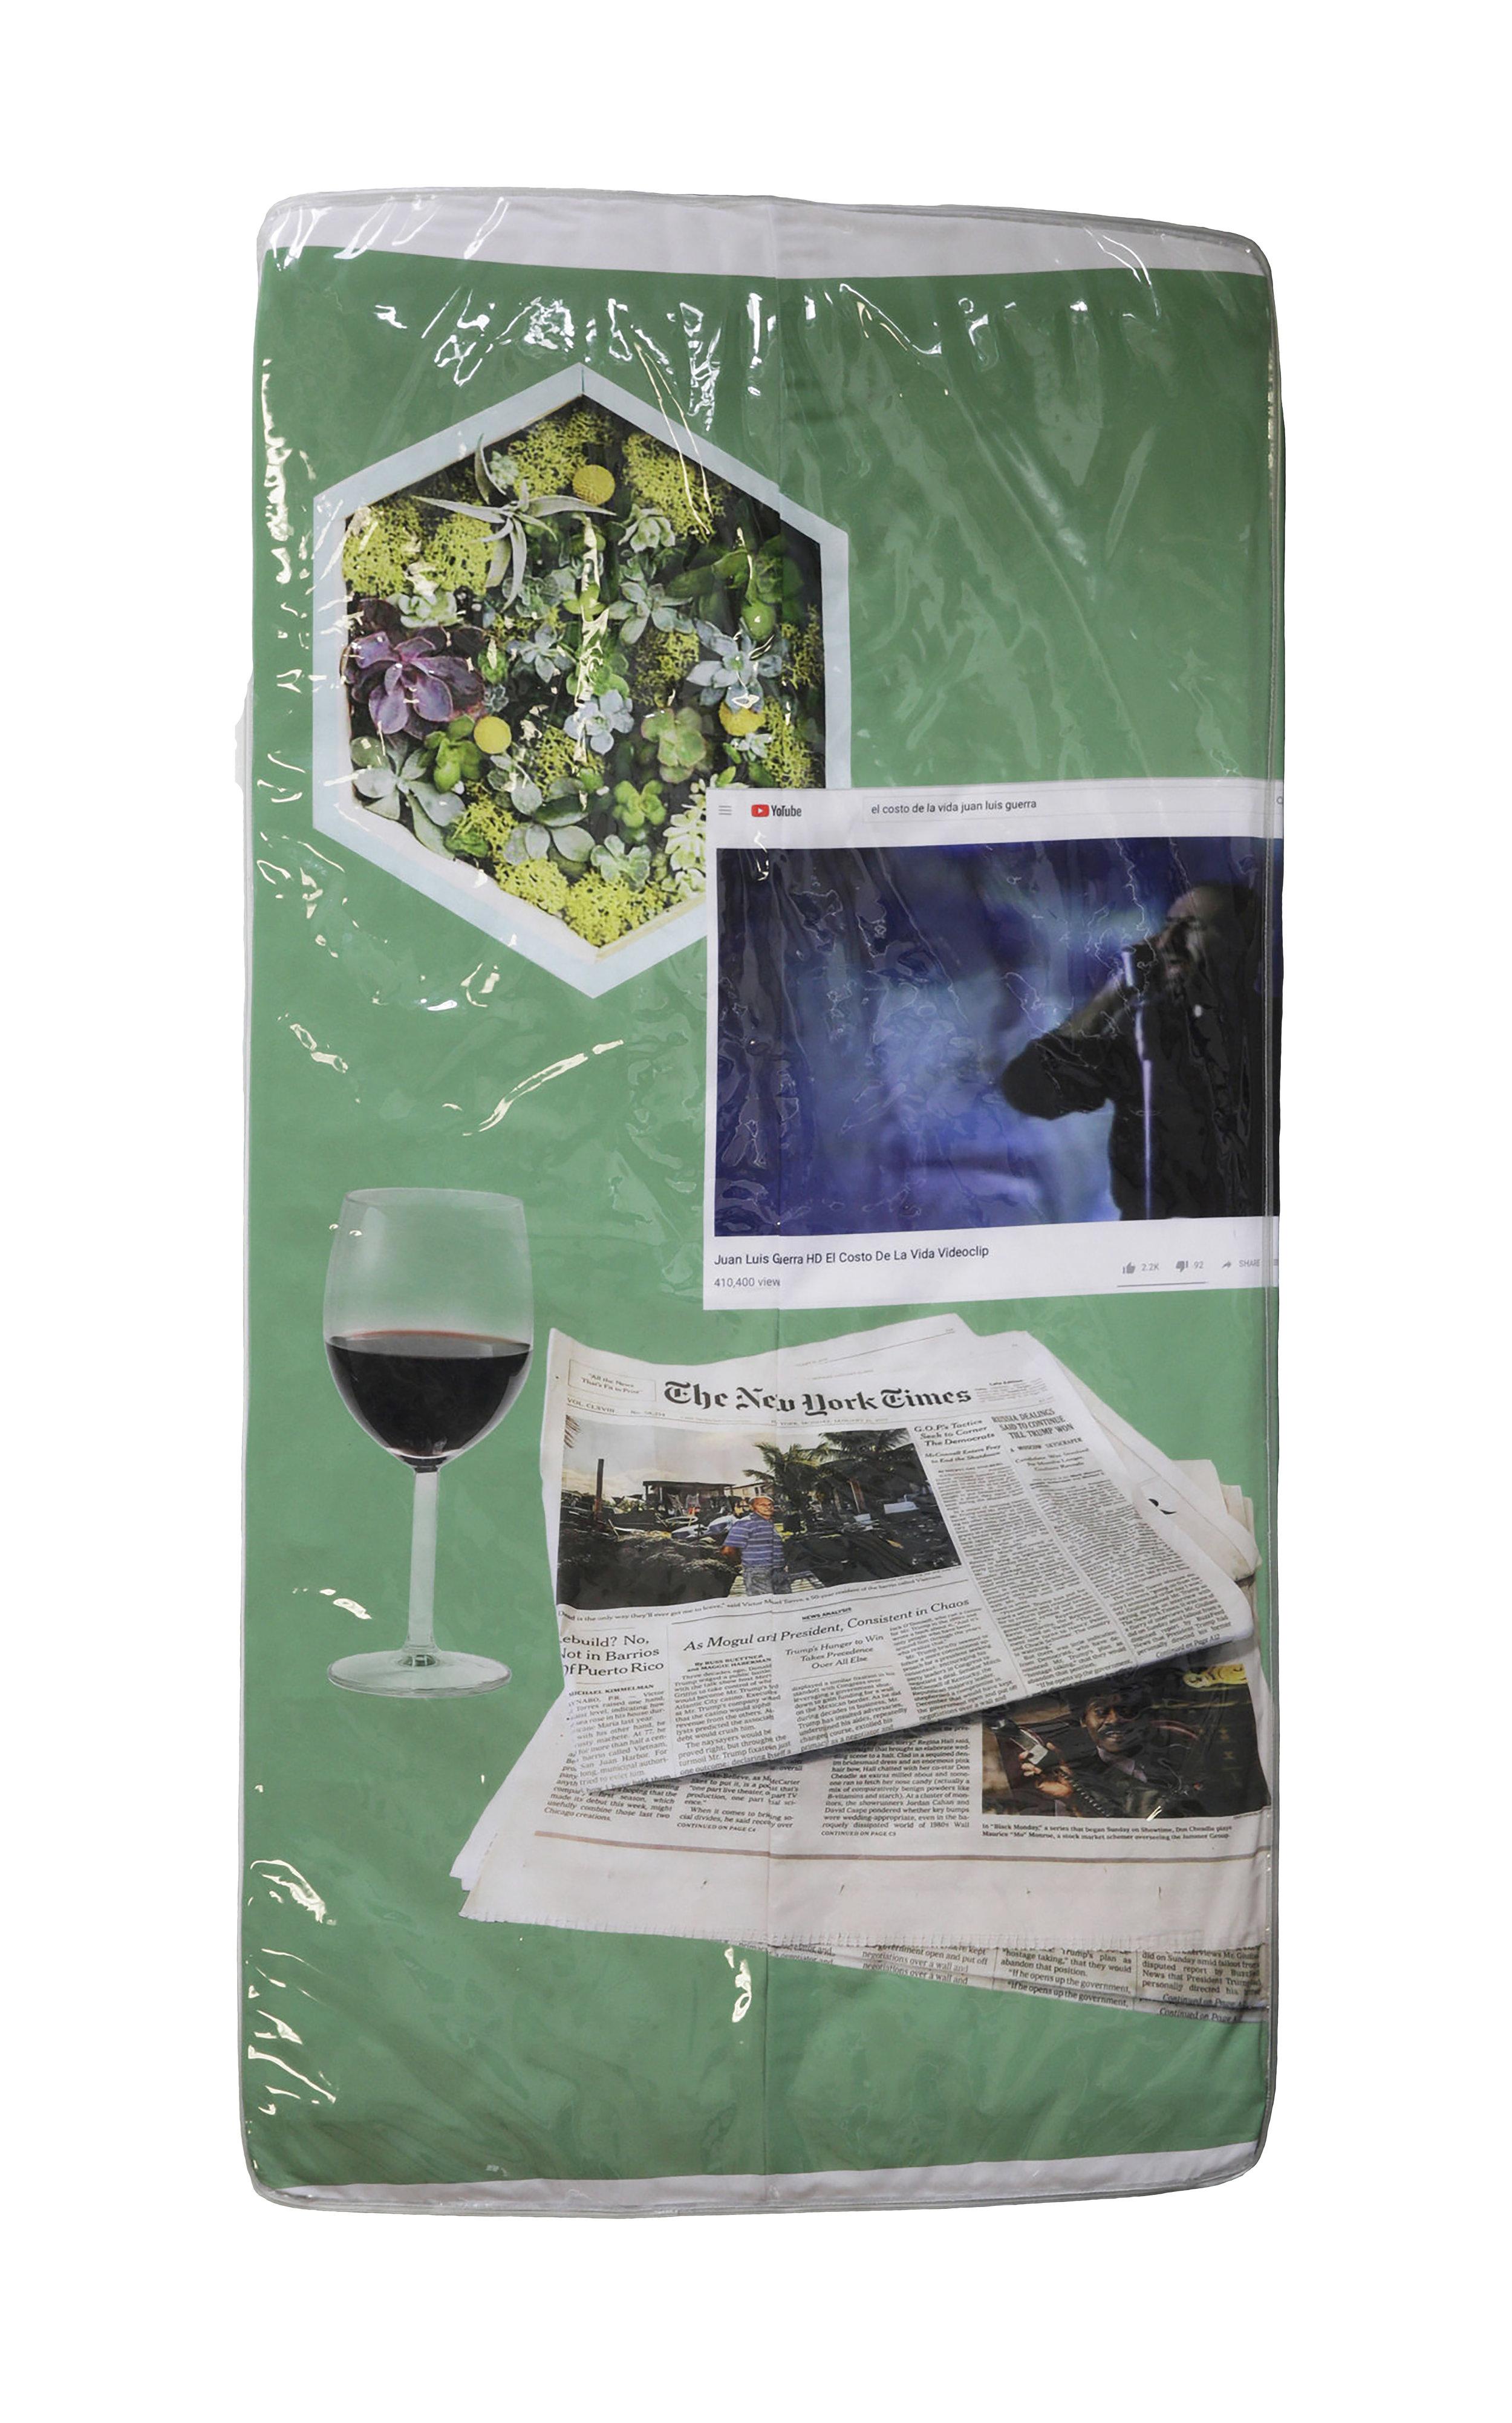 El Costo de la Vida      Digital print on cotton fitted sheet, Twin Mattress 74 x 38 1/2 x 6 in $12,000